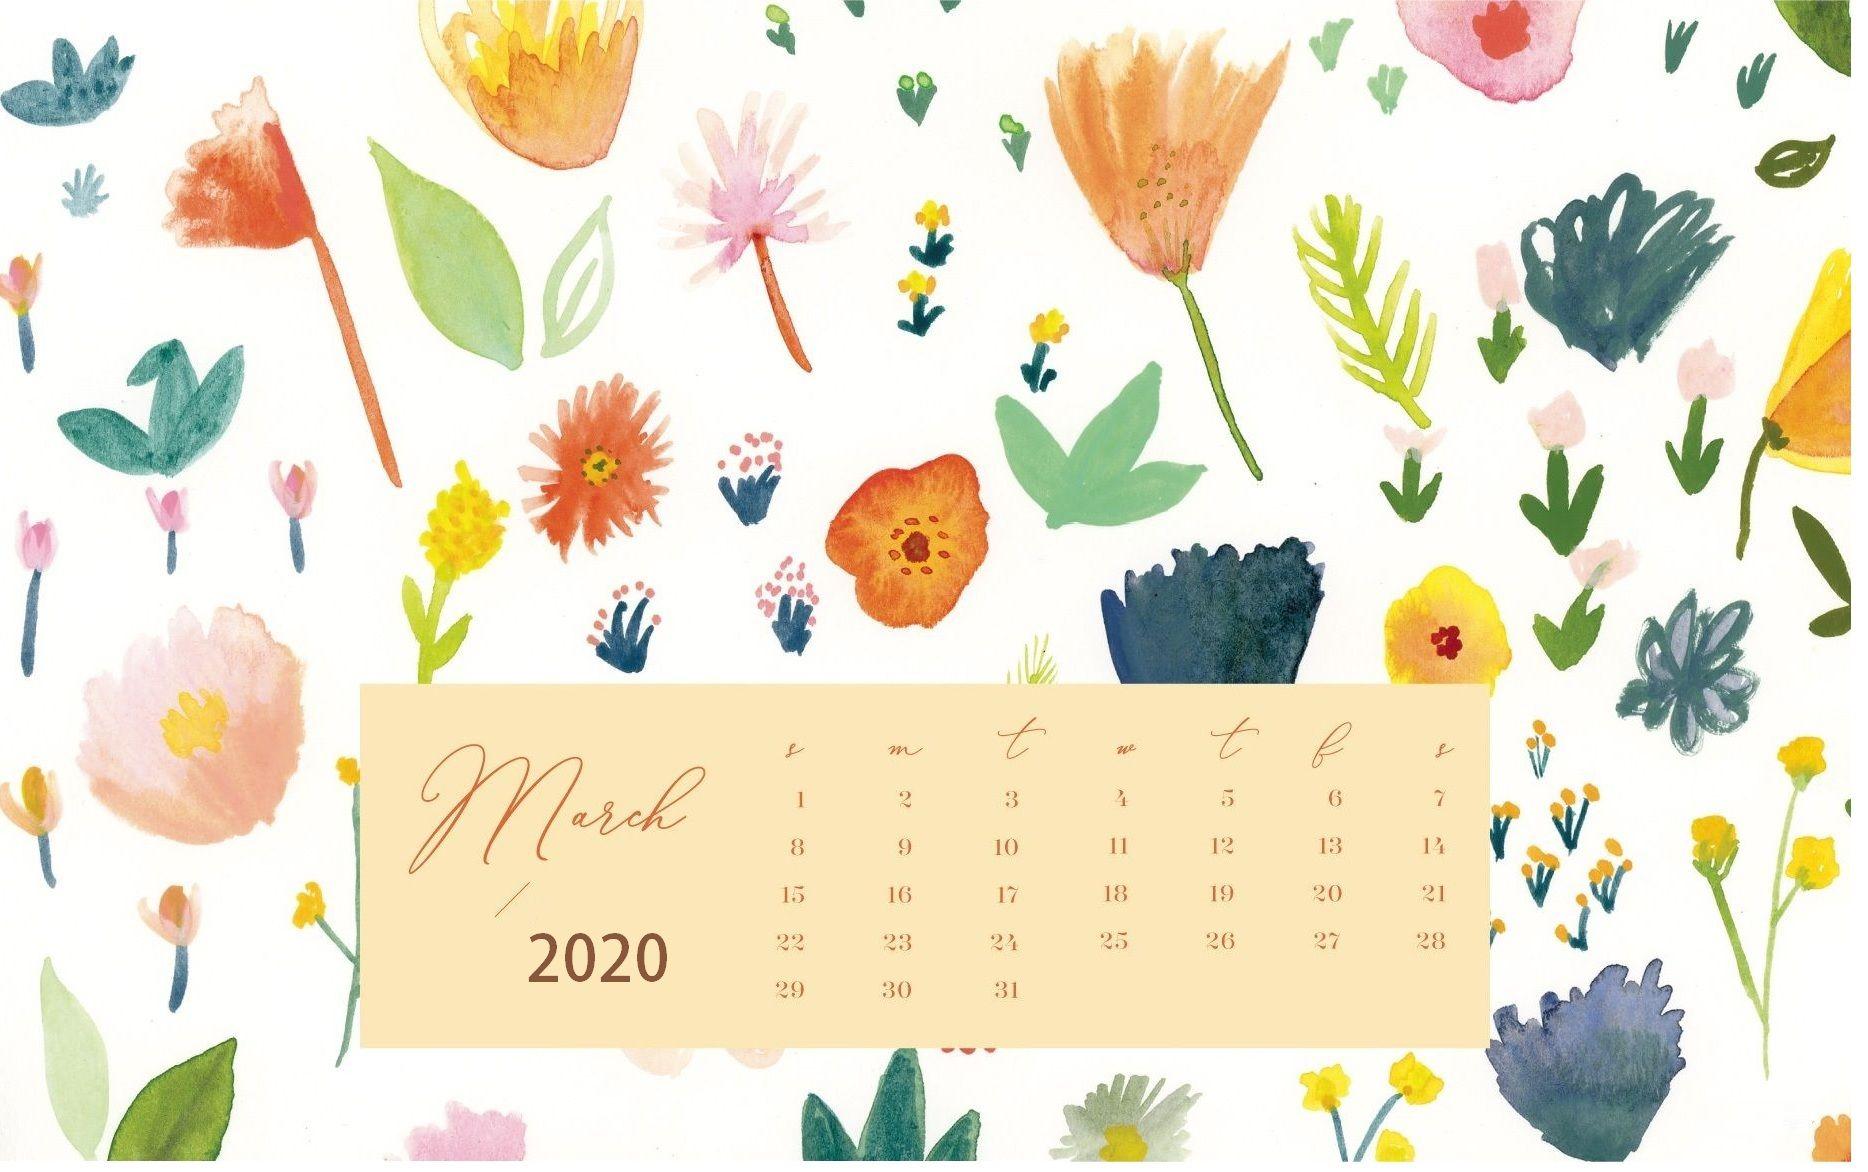 Floral March Calendar 2020 Cute Wallpaper for Desktop